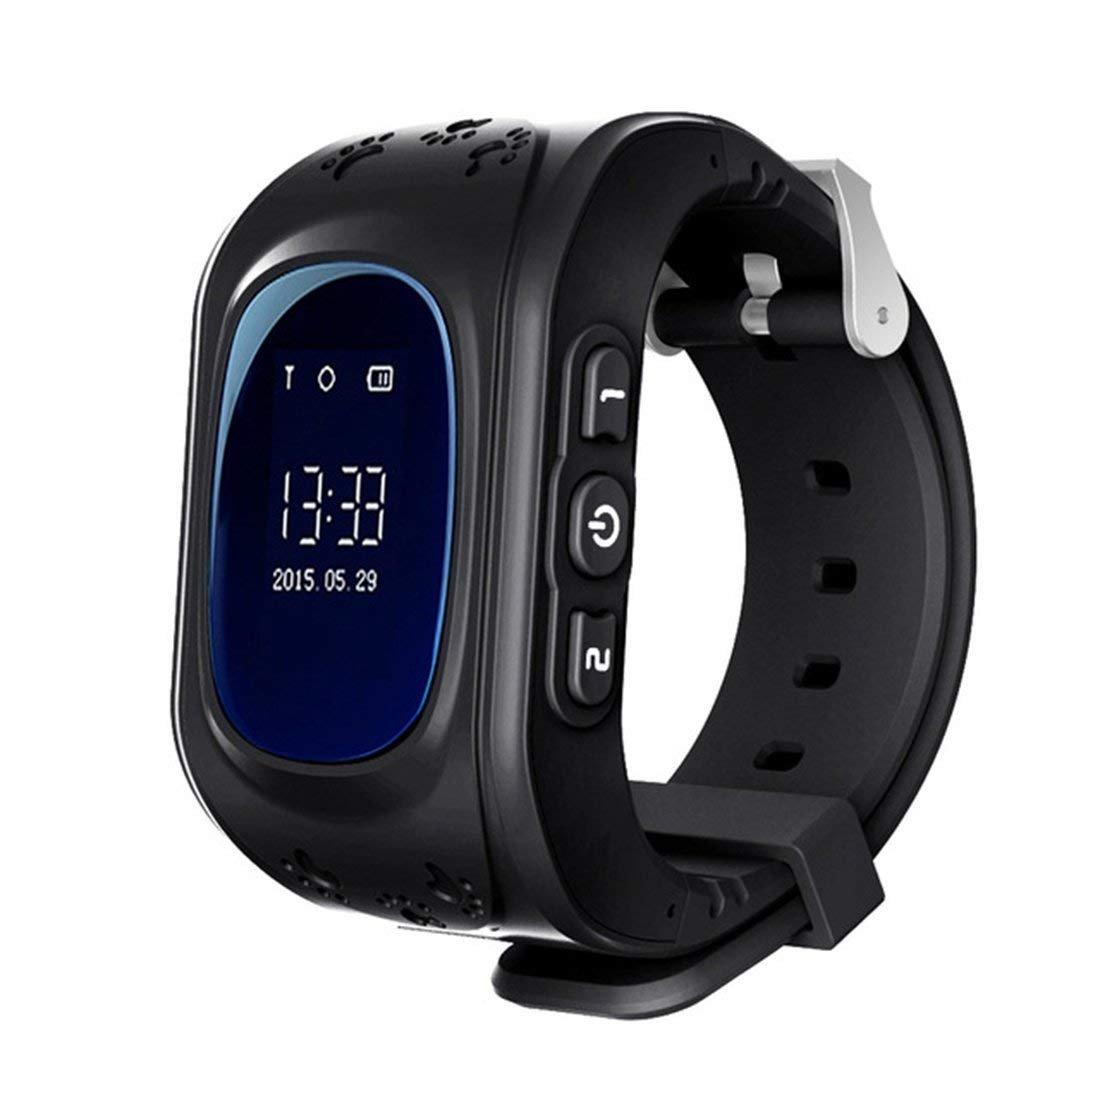 Kids Smart Watch Girls Boys Digital Watch with Anti-Lost SOS Button GPS Tracker Smartwatch  black